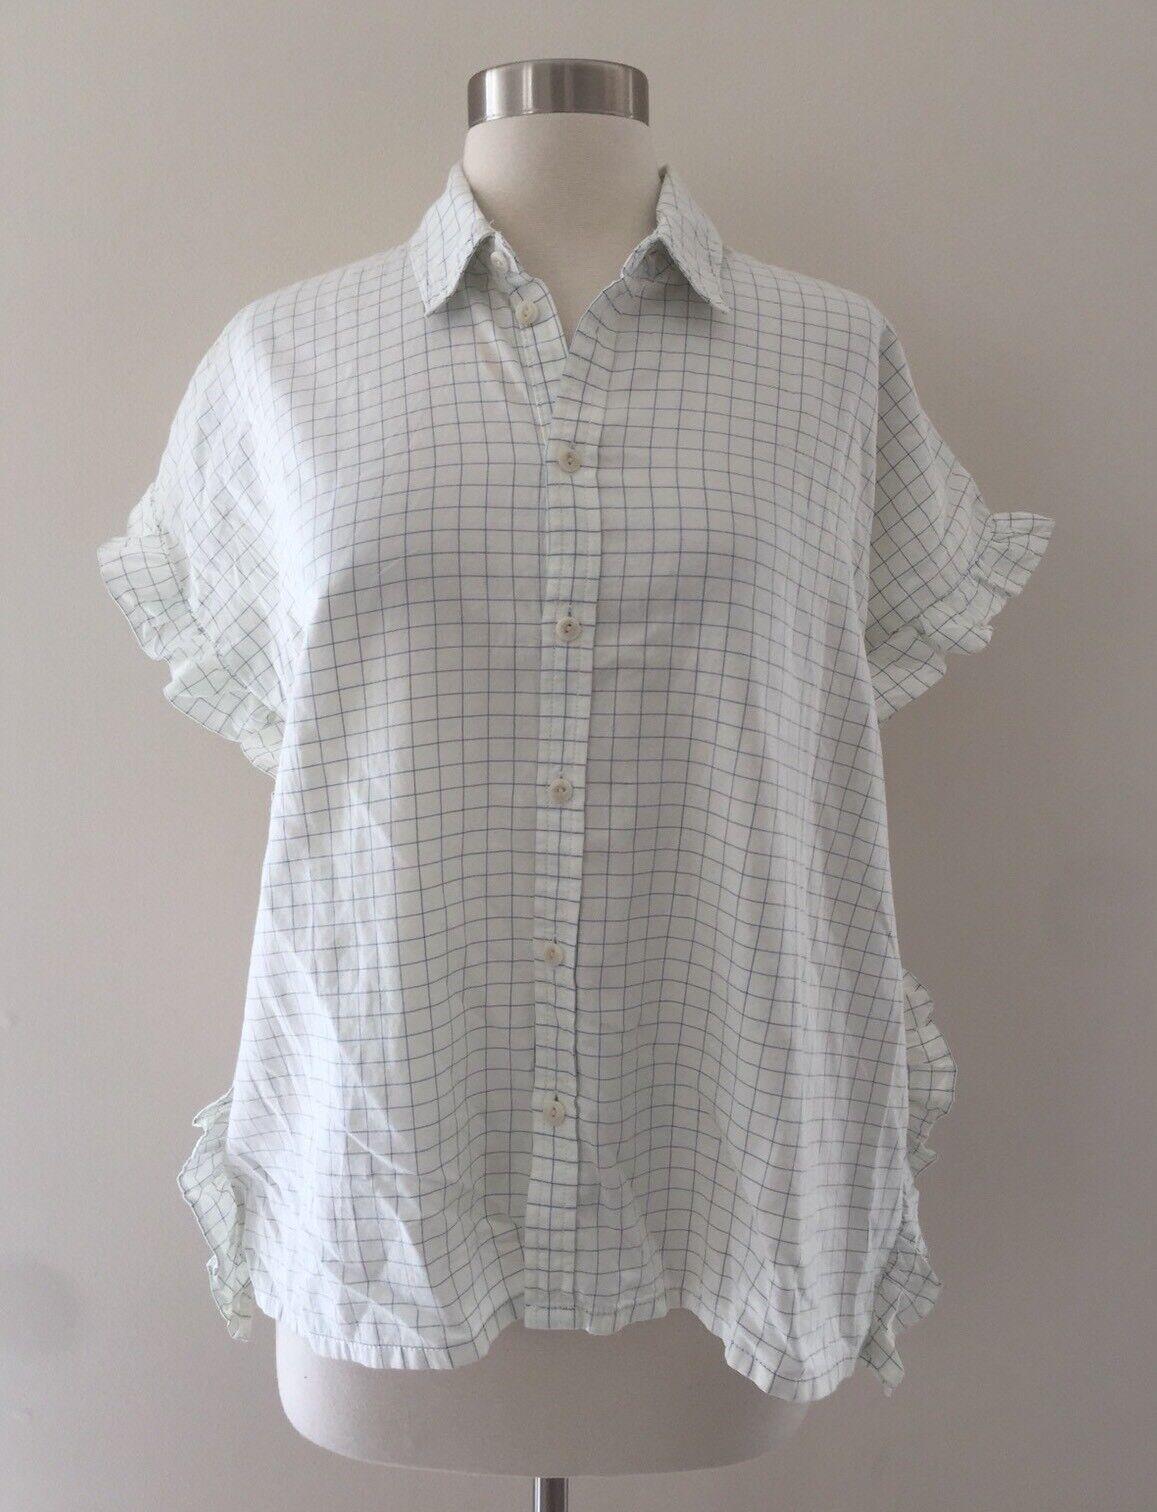 New Madewell Windowpane Ruffle-side Shirt Top Blouse Off Weiß Sz S Small G7333